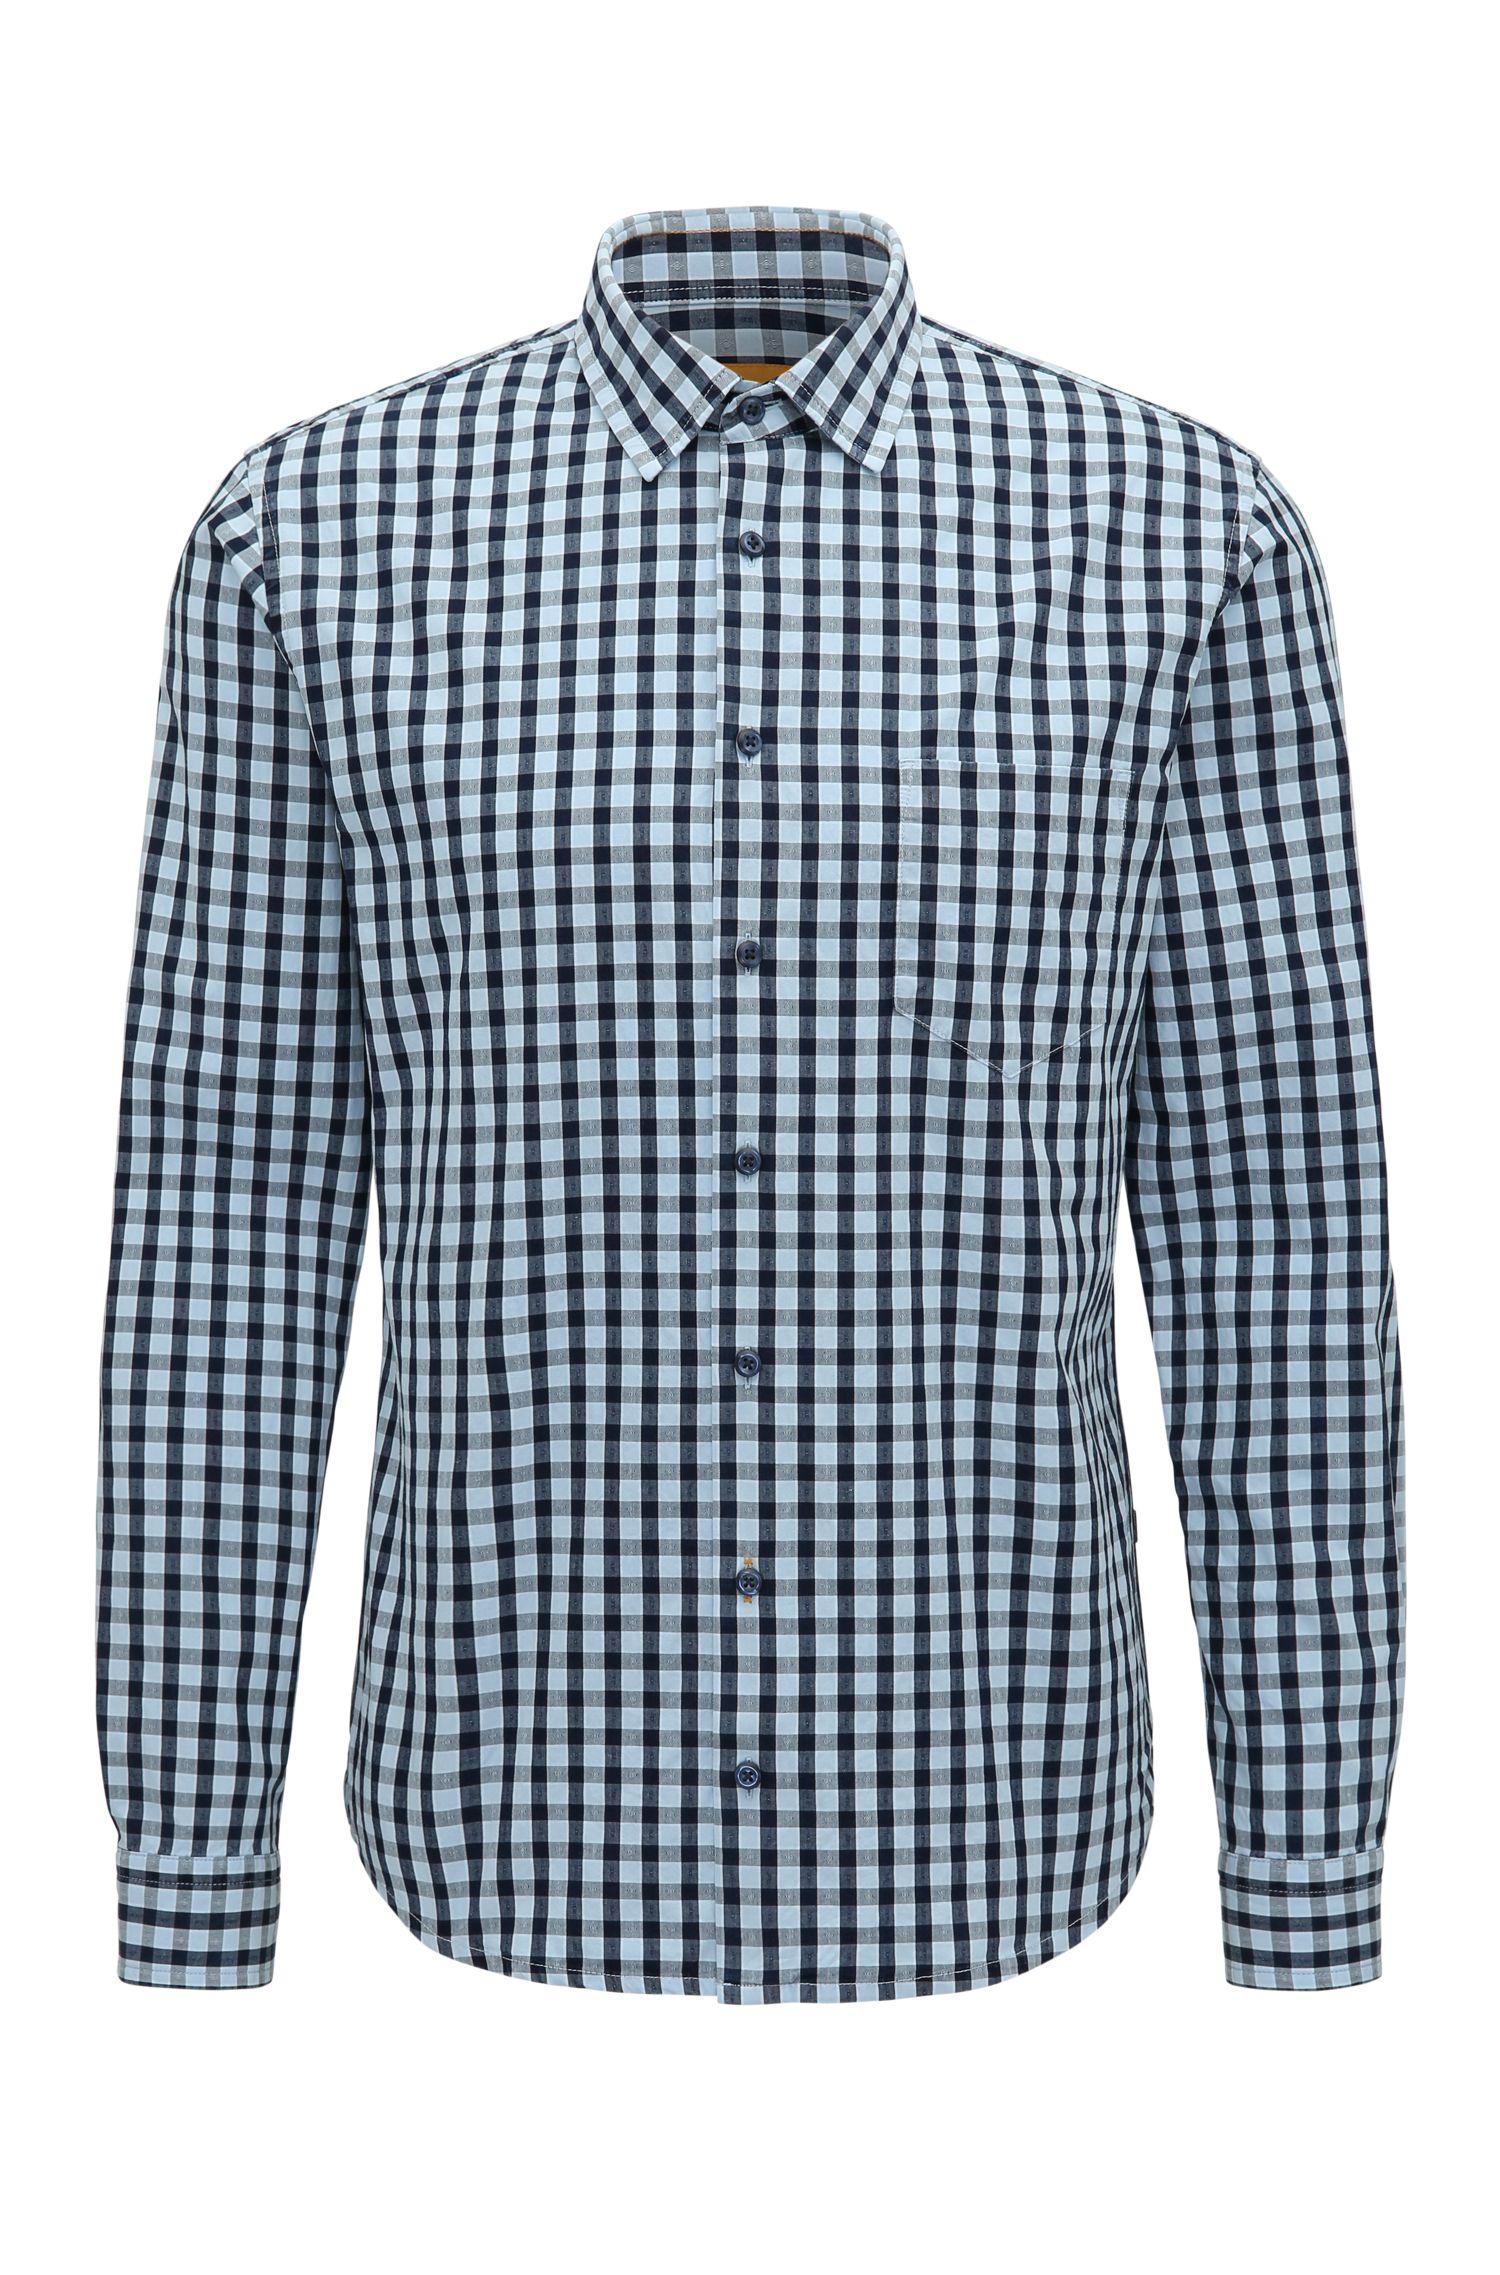 Gingham Cotton Sport Shirt, Slim Fit | Epop